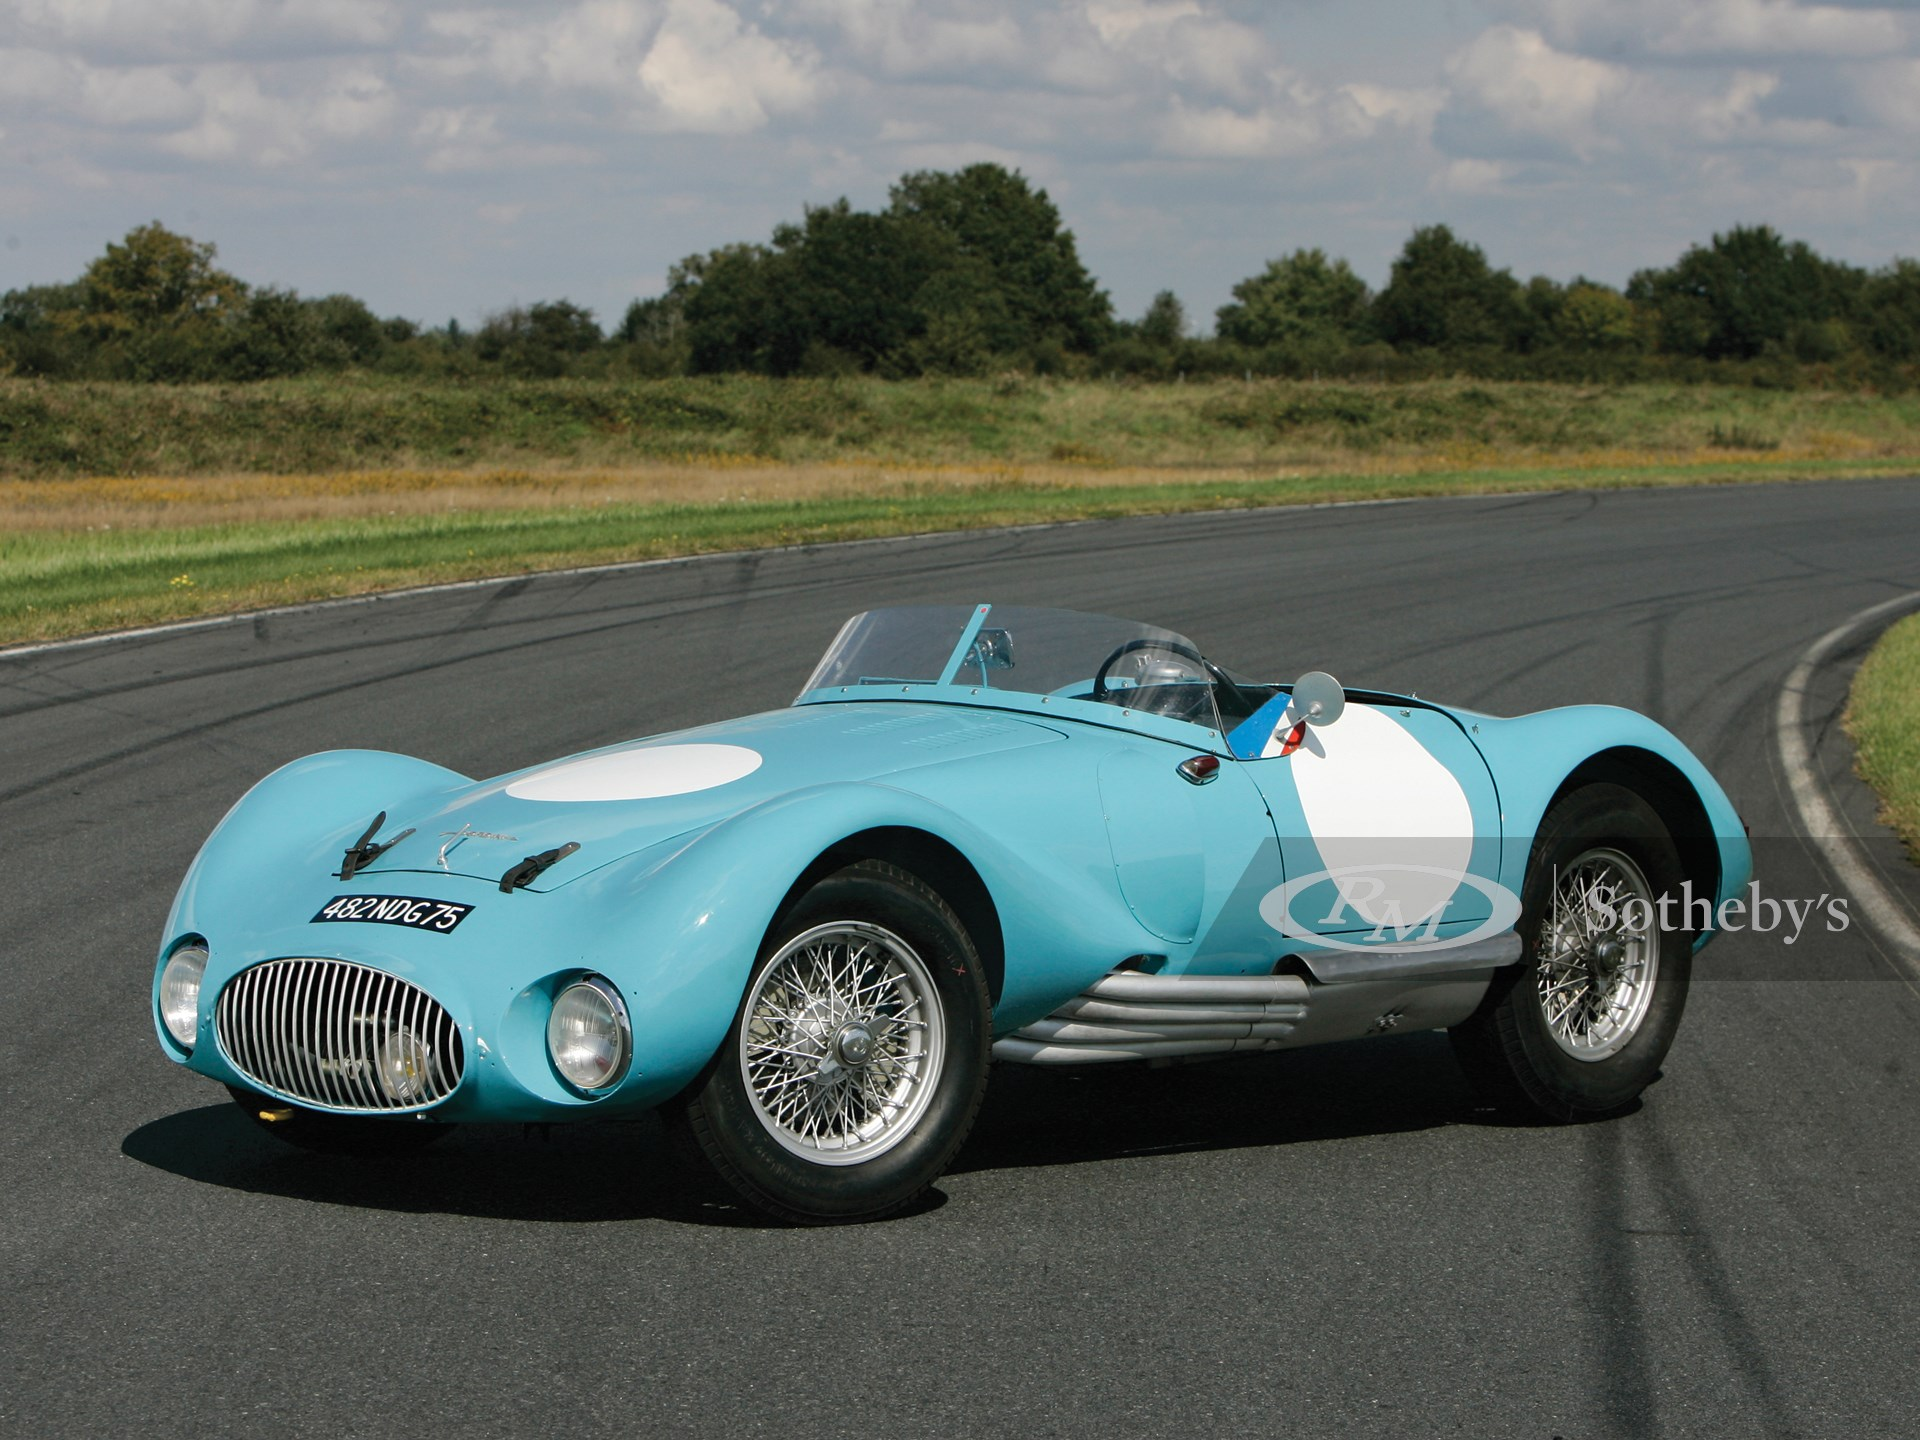 1953 Gordini Type 24 S